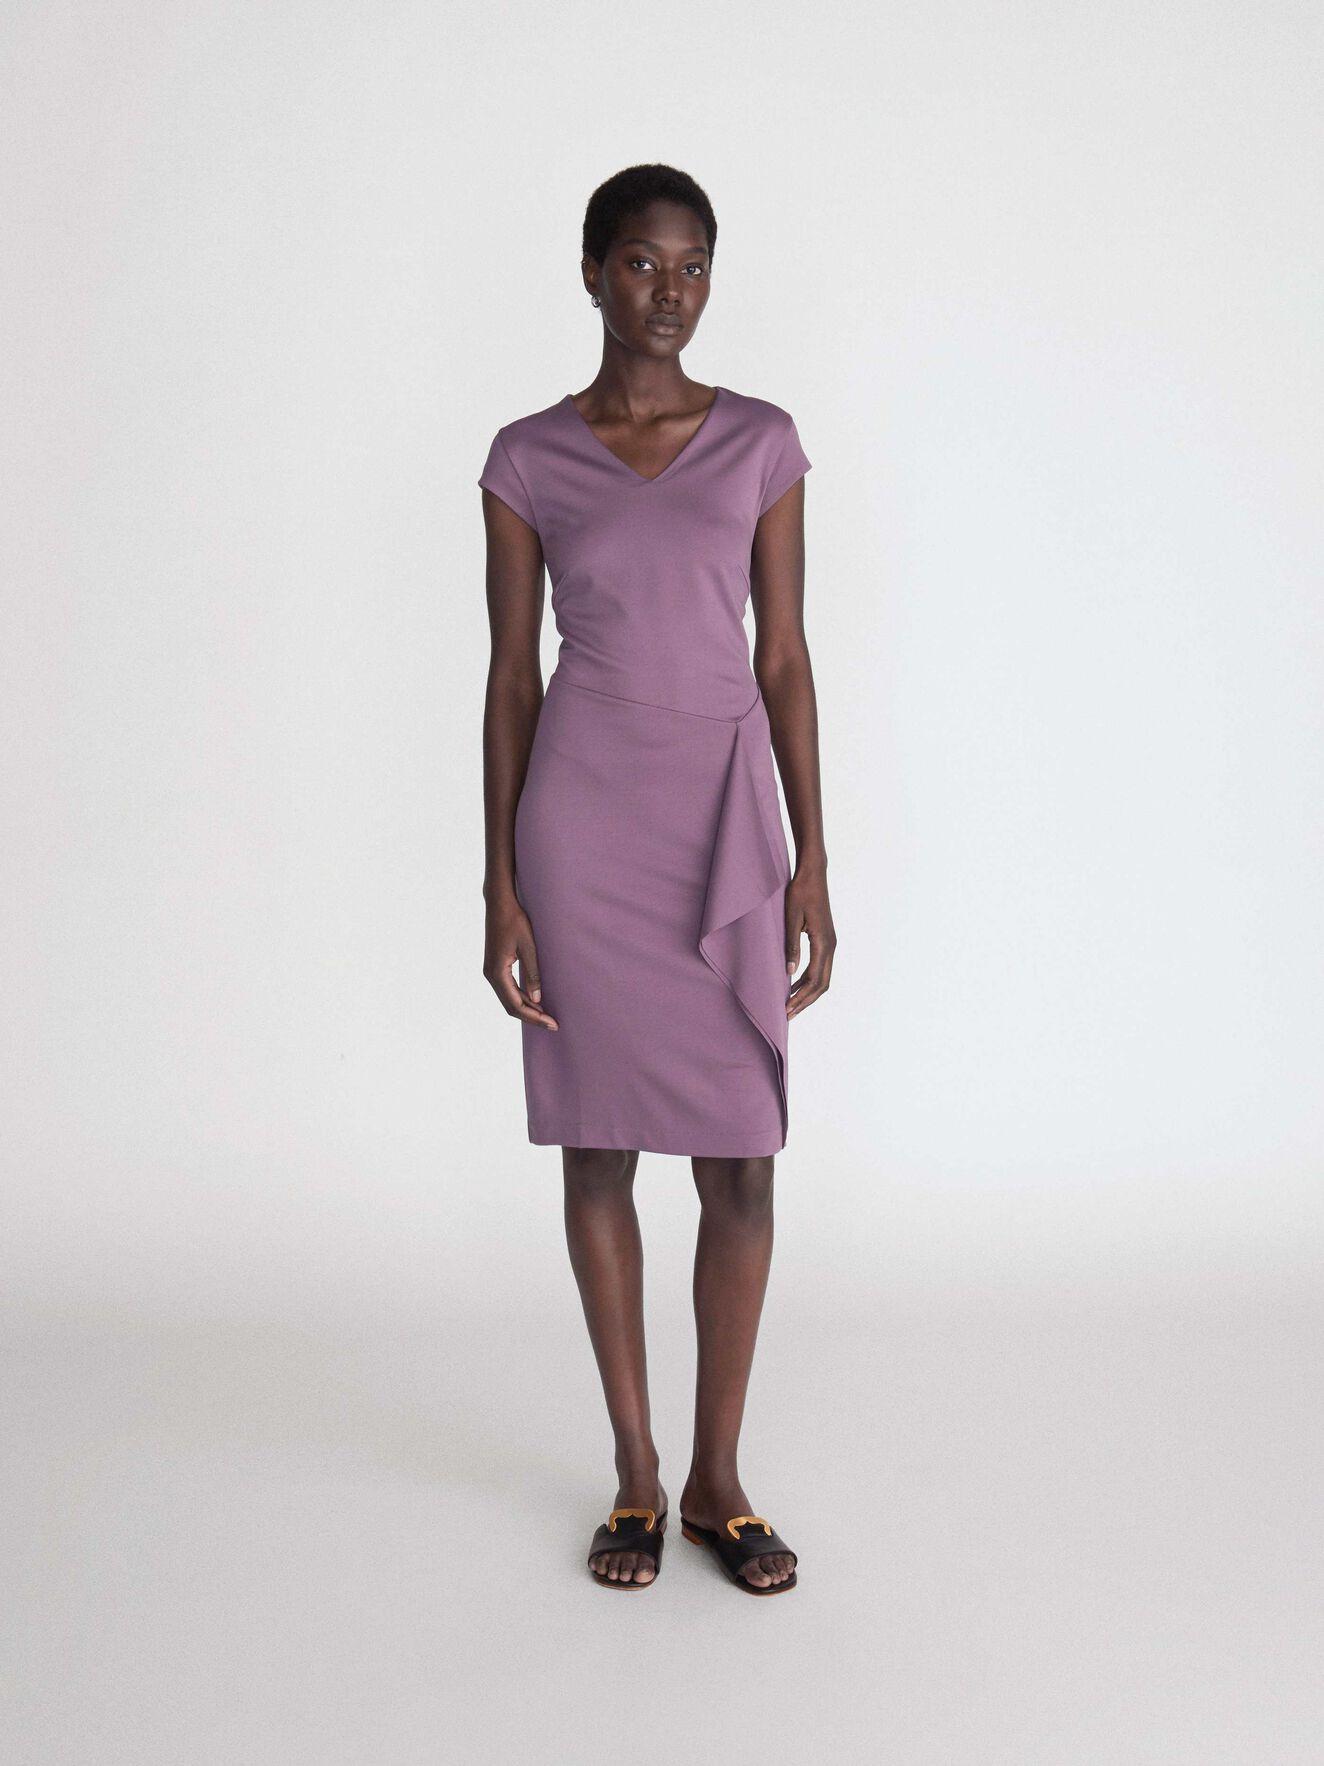 Amethyste Dress in Light Grape from Tiger of Sweden